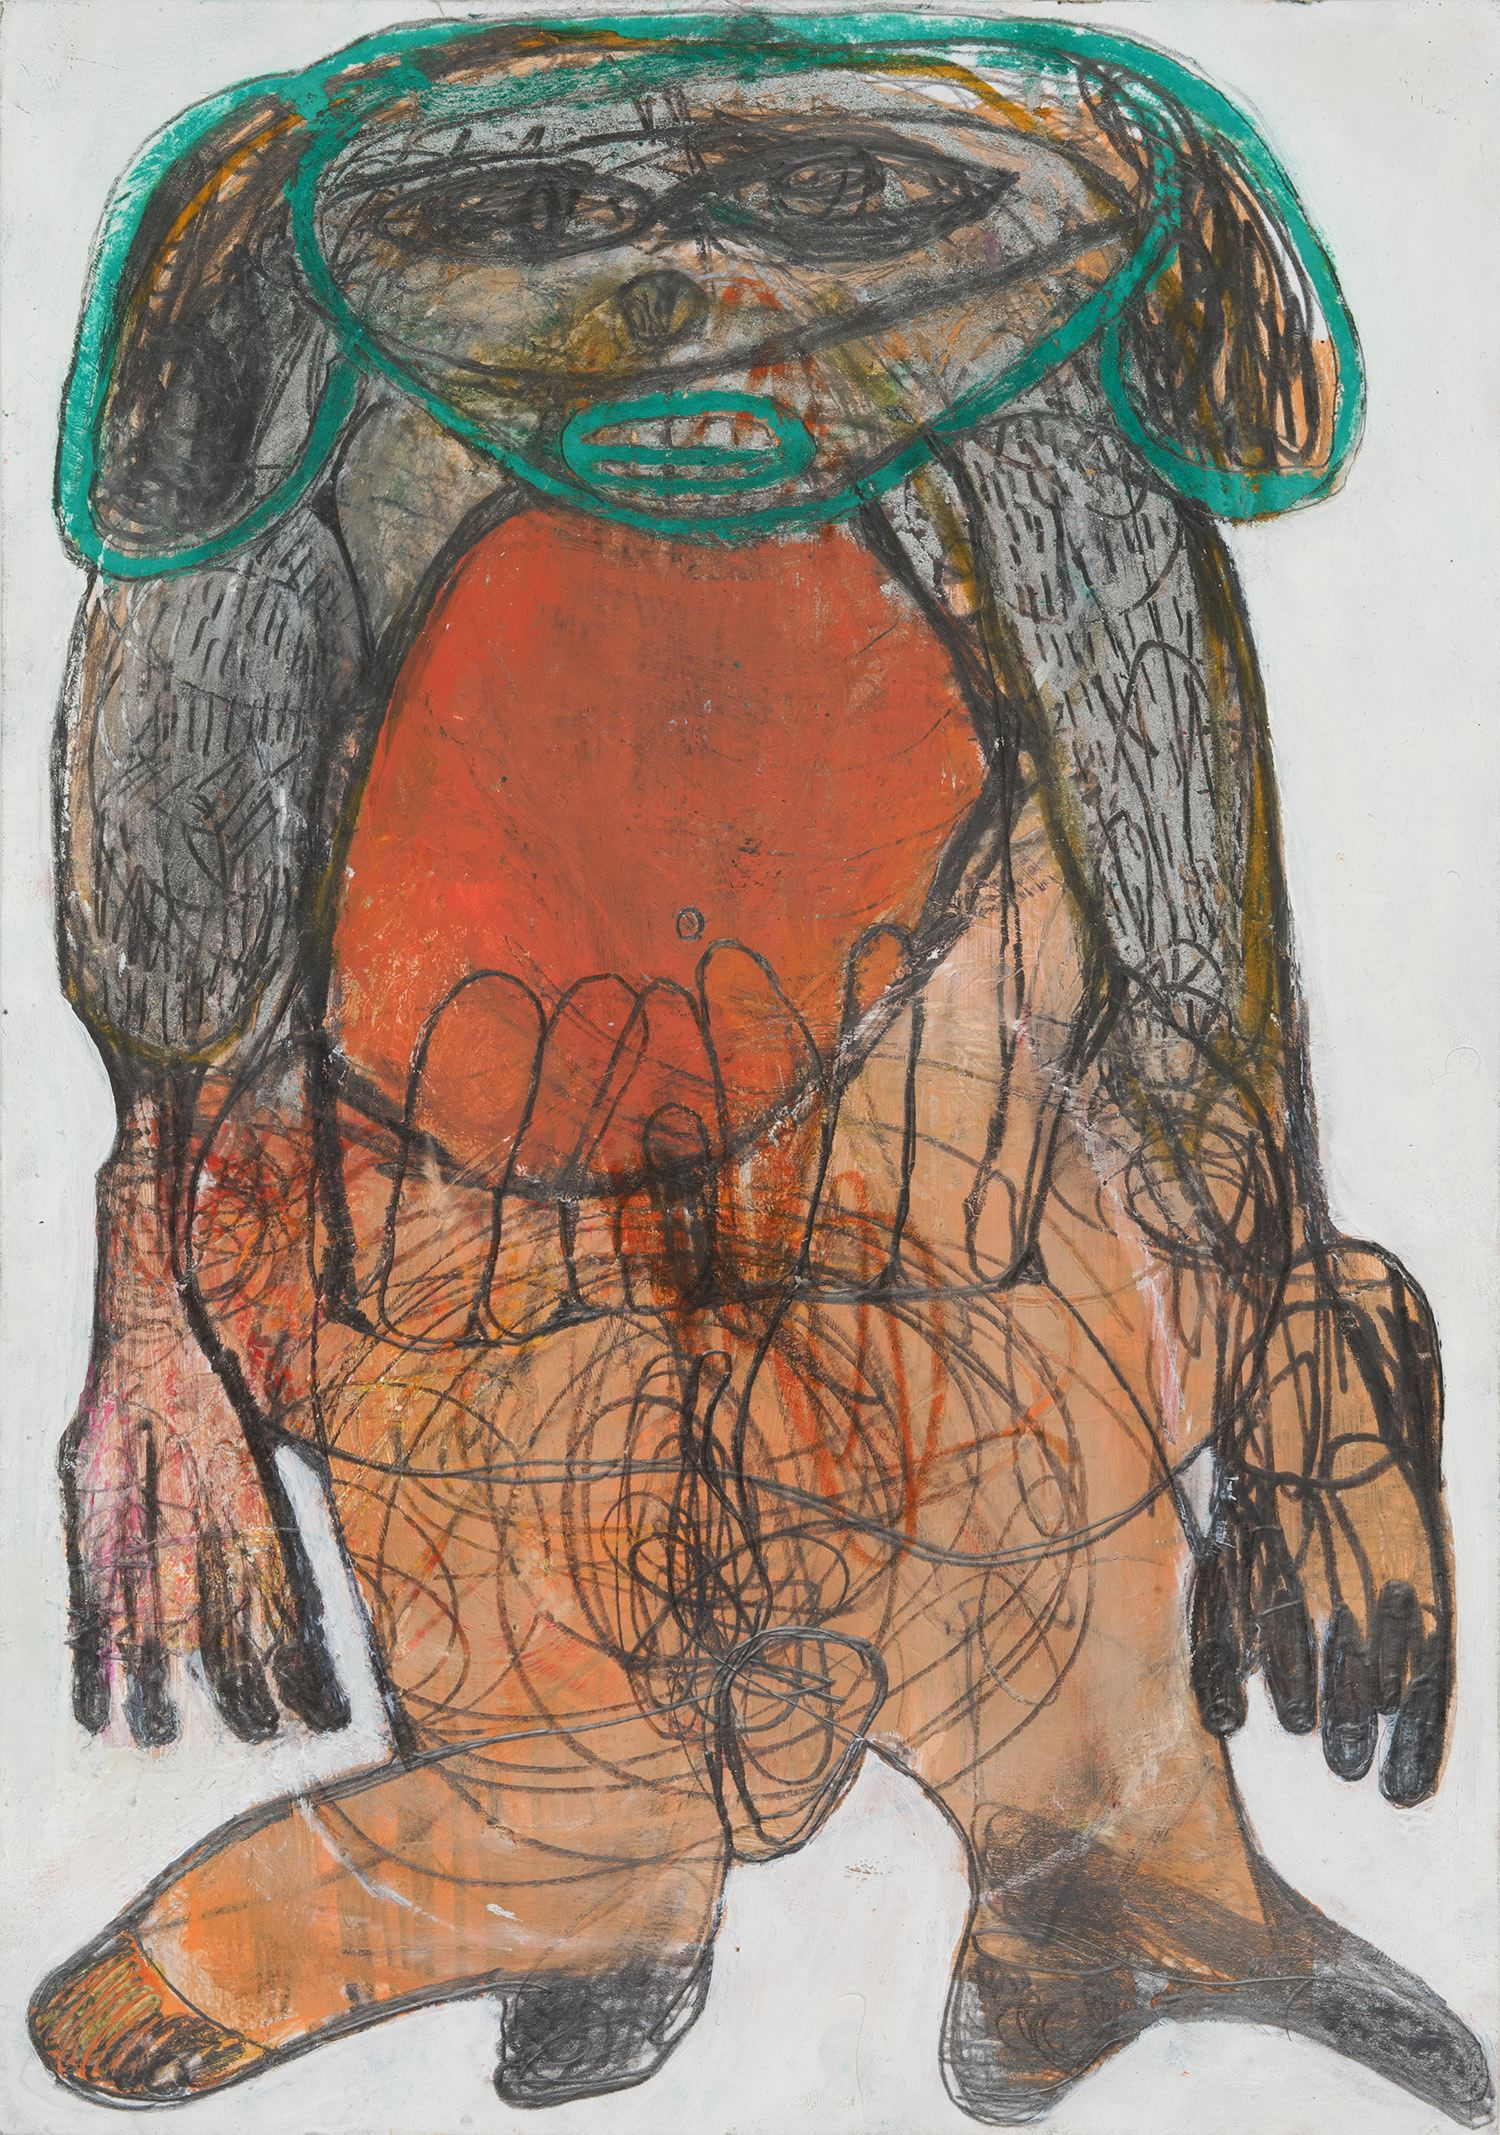 Caroline Demangel    Untitled  , 2014 Mixed media on paper 11.75 x 8.25 inches 29.8 x 21 cm CDm 3